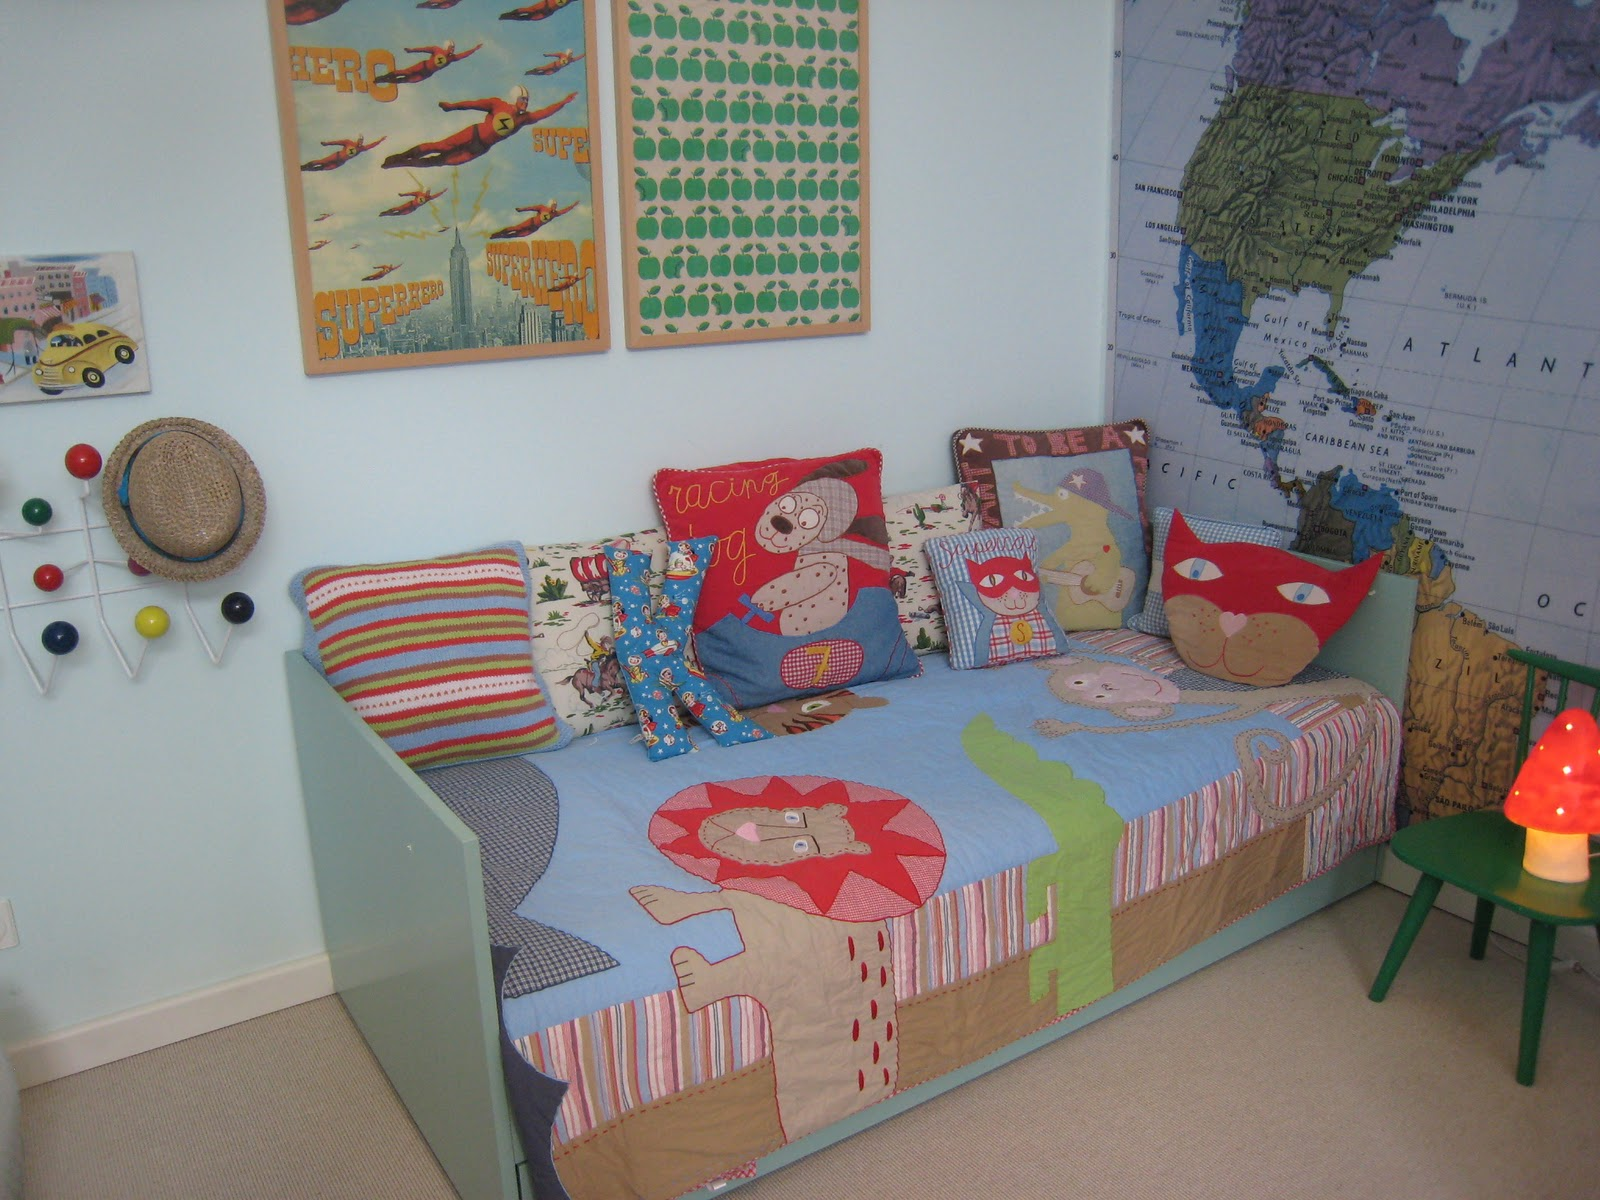 My circus kinderzimmer - Kinderzimmer julia ...